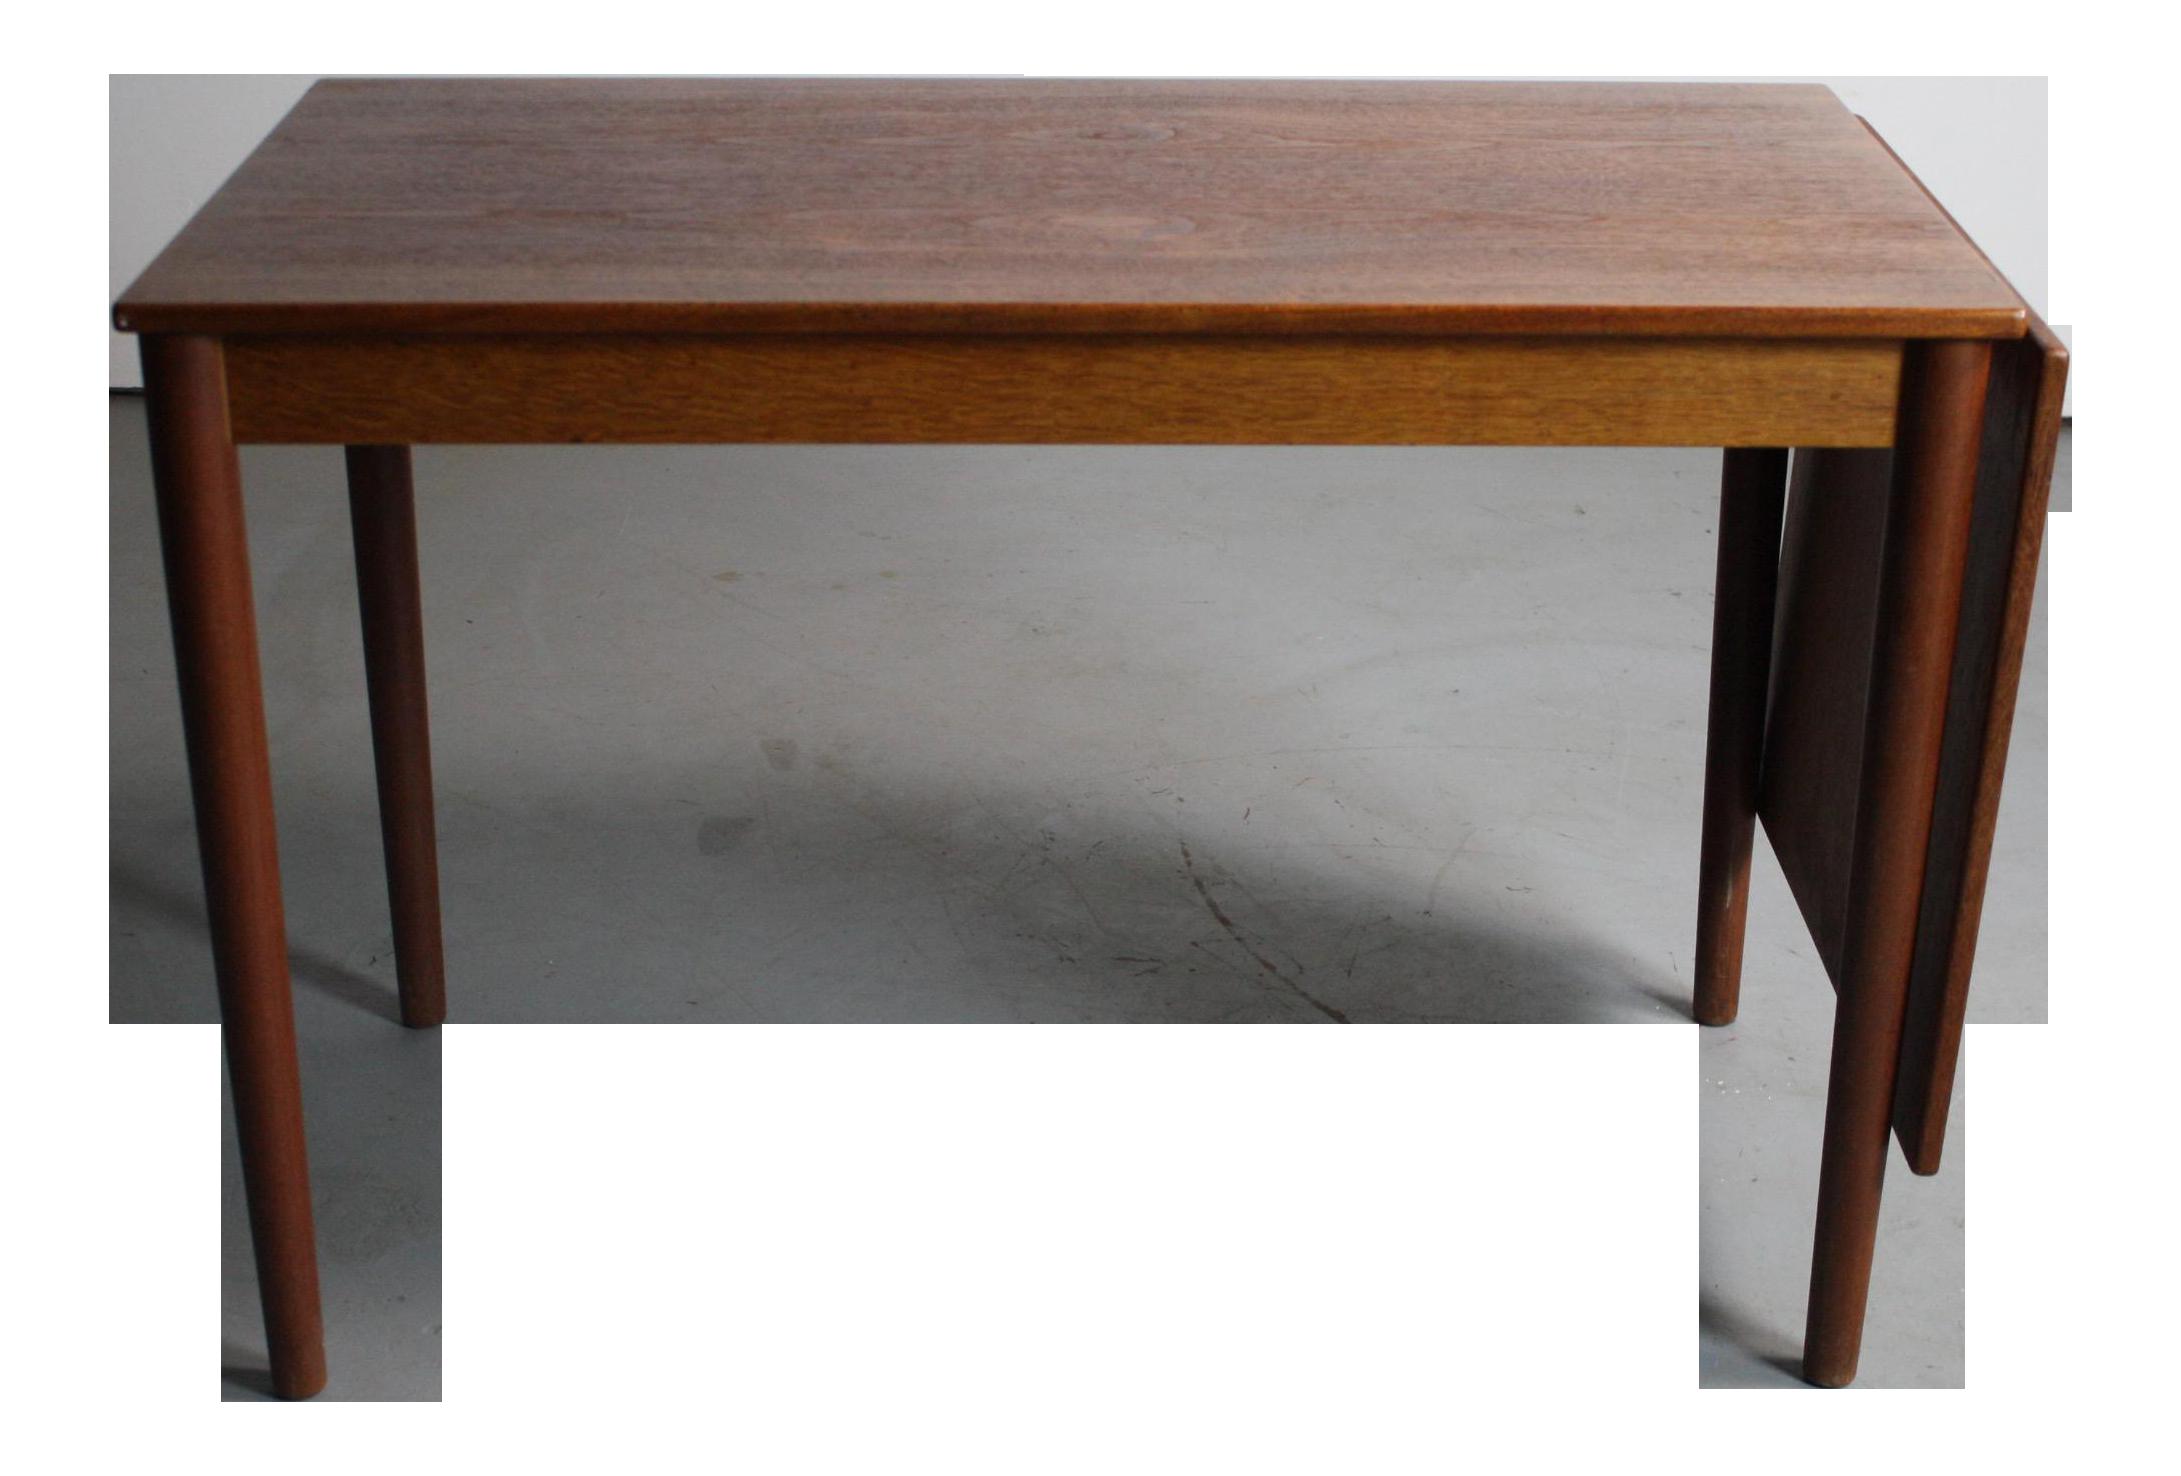 sleek & simple arne vodder danish modern writing desk | chairish